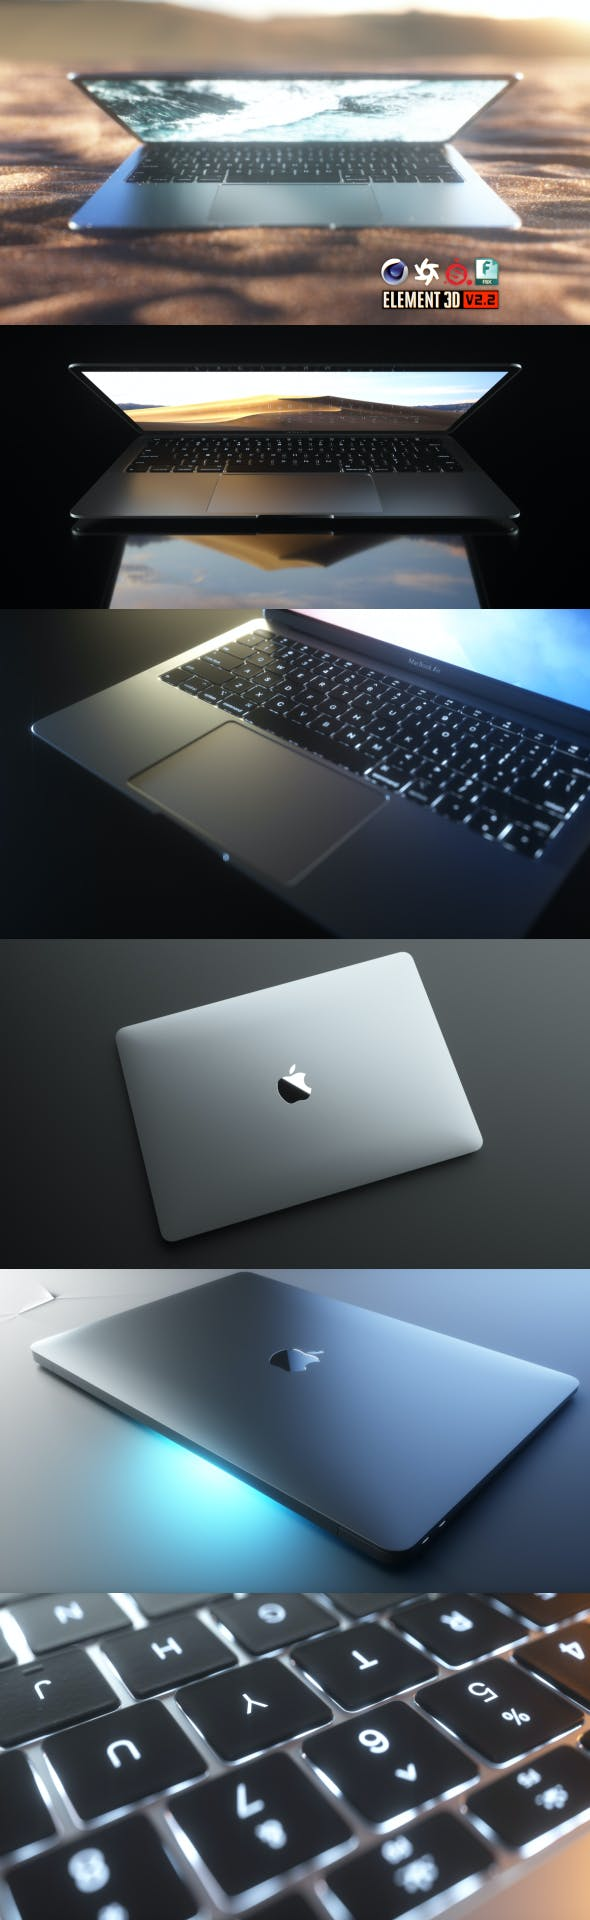 MacBook Air 2018 - 3DOcean Item for Sale